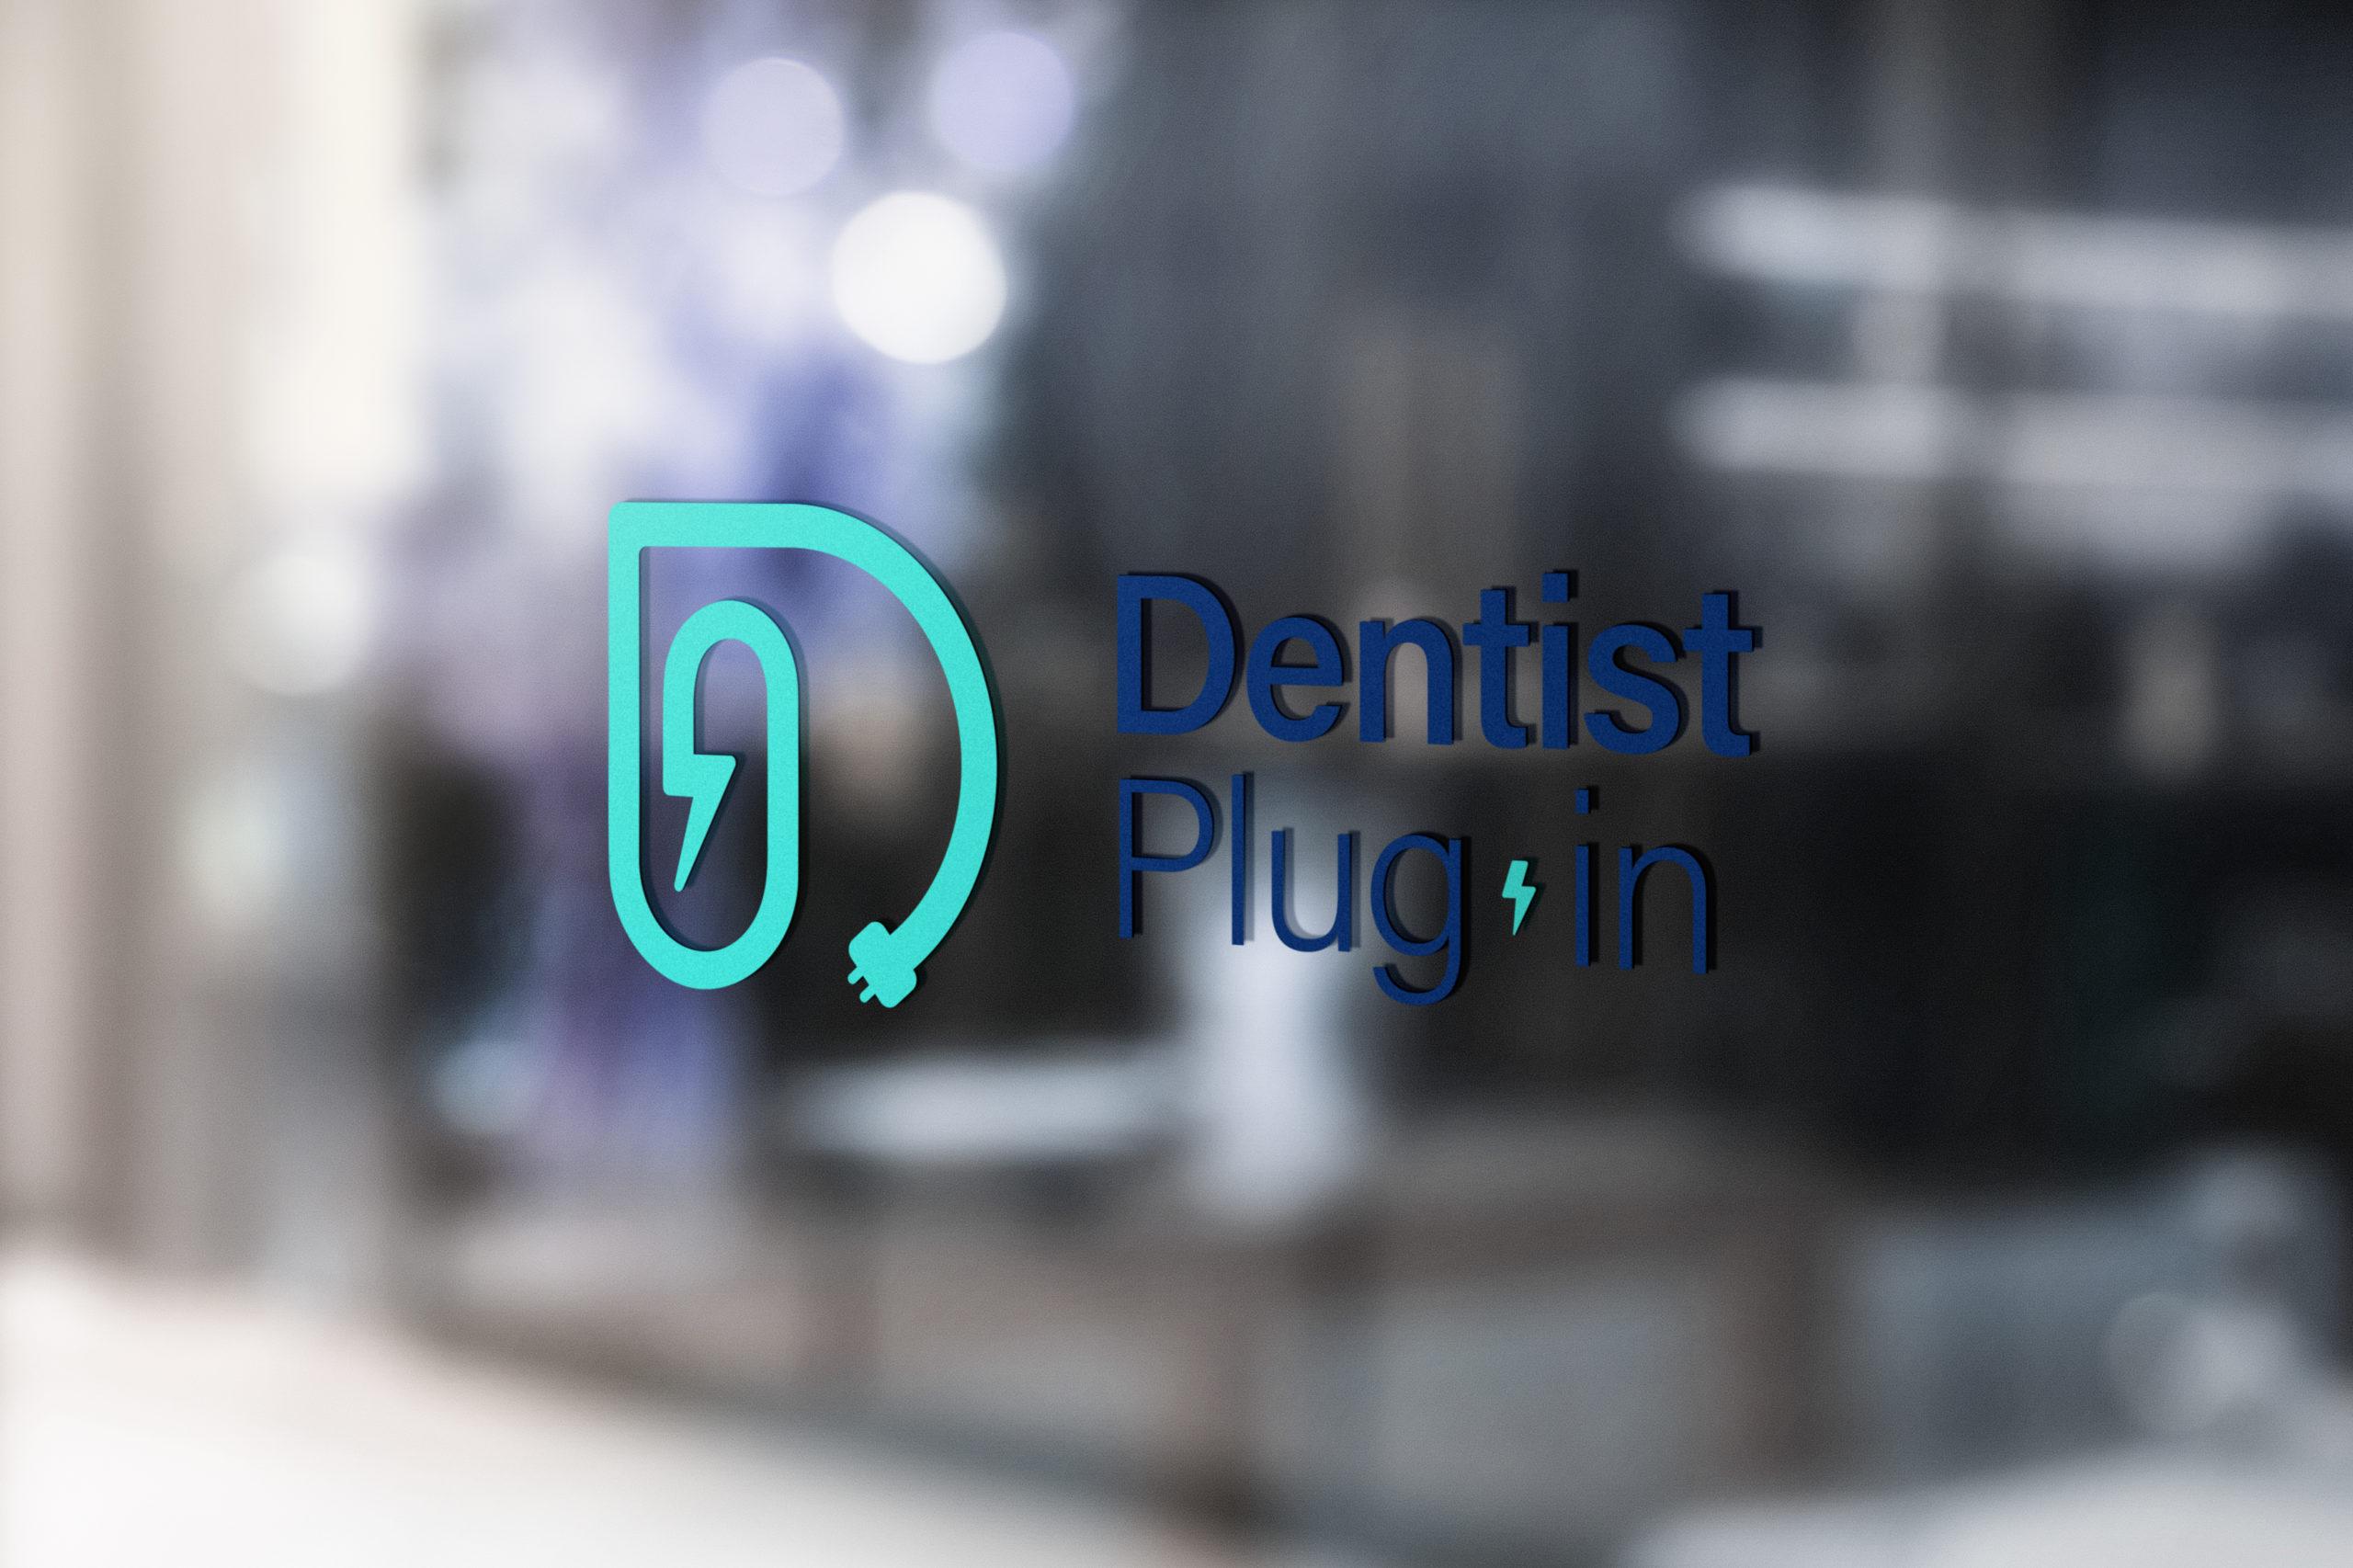 Dentist Plugin 丹提思聚苑